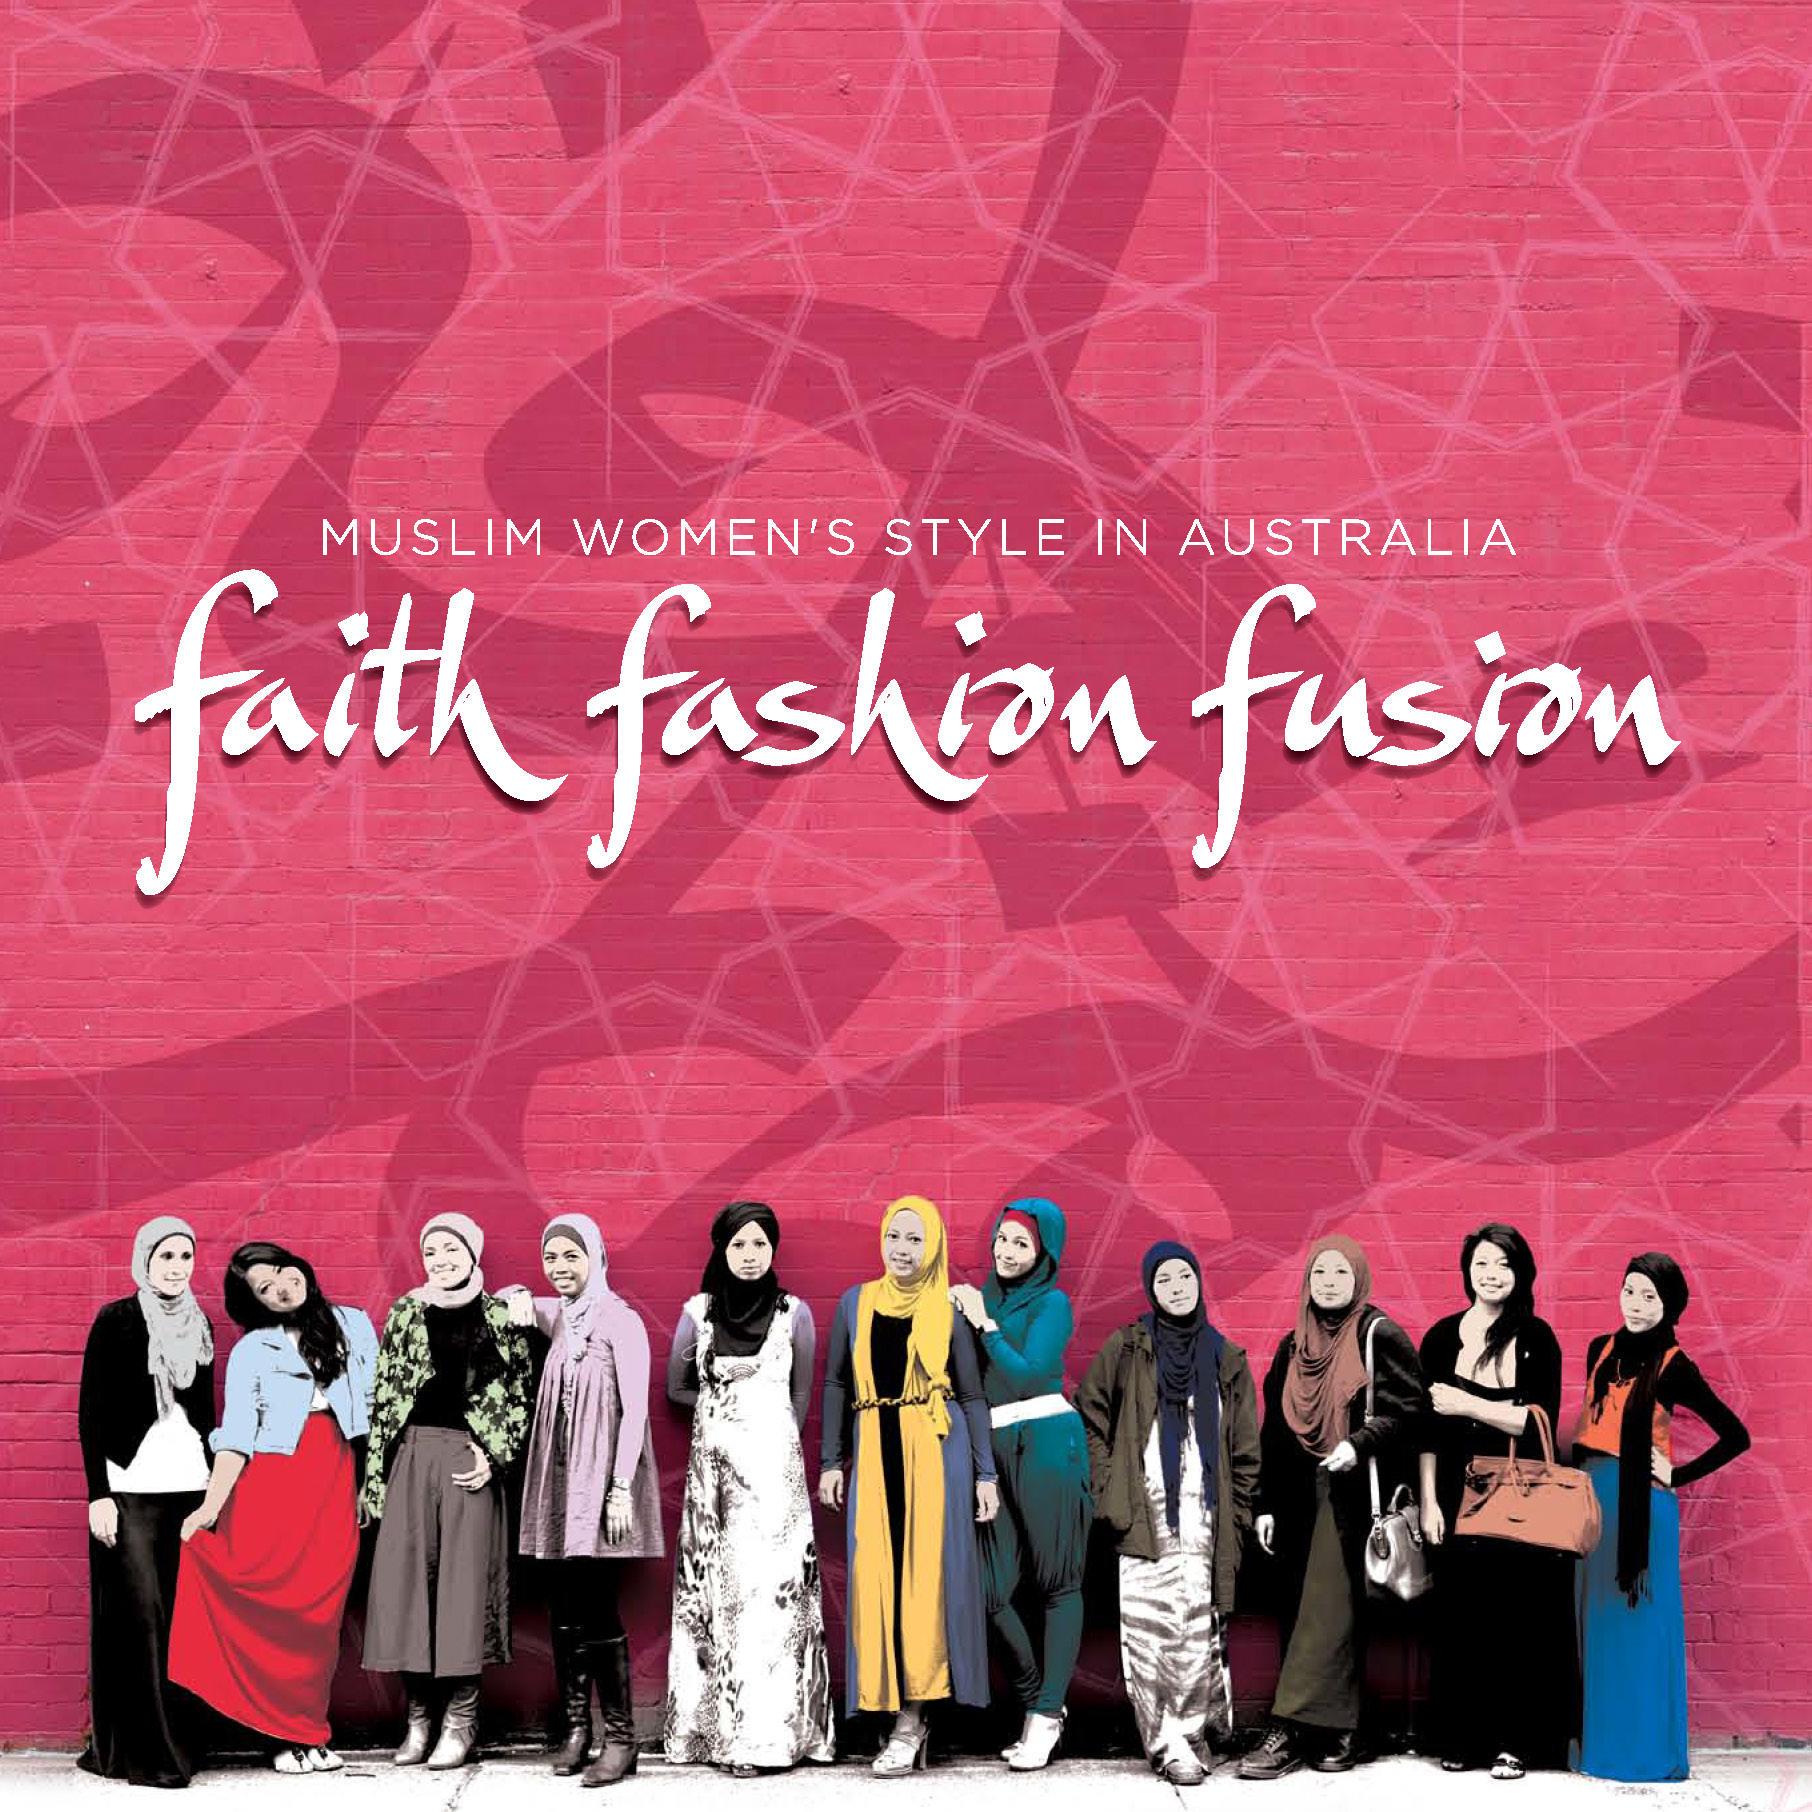 Book cover, Faith, Fashion, Fusion: Muslim Women's Style in Australia.